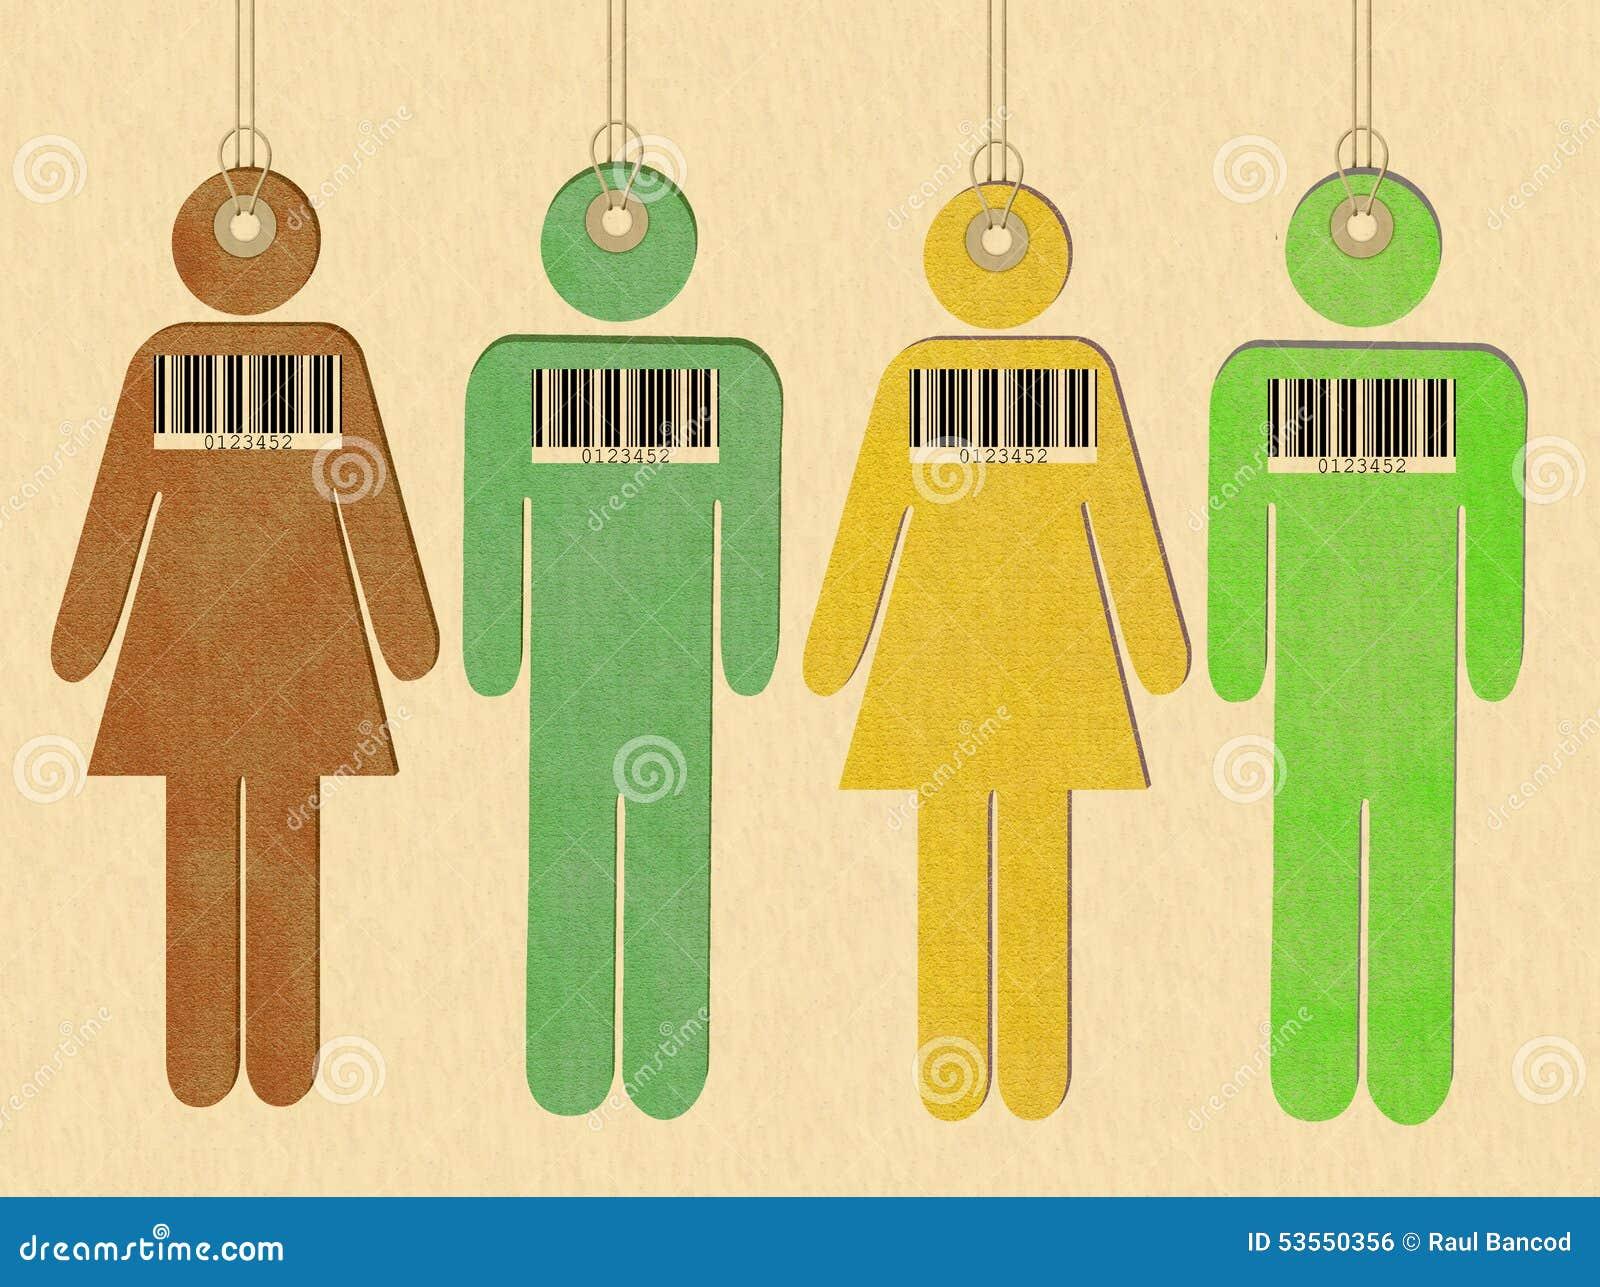 free clip art human trafficking - photo #20